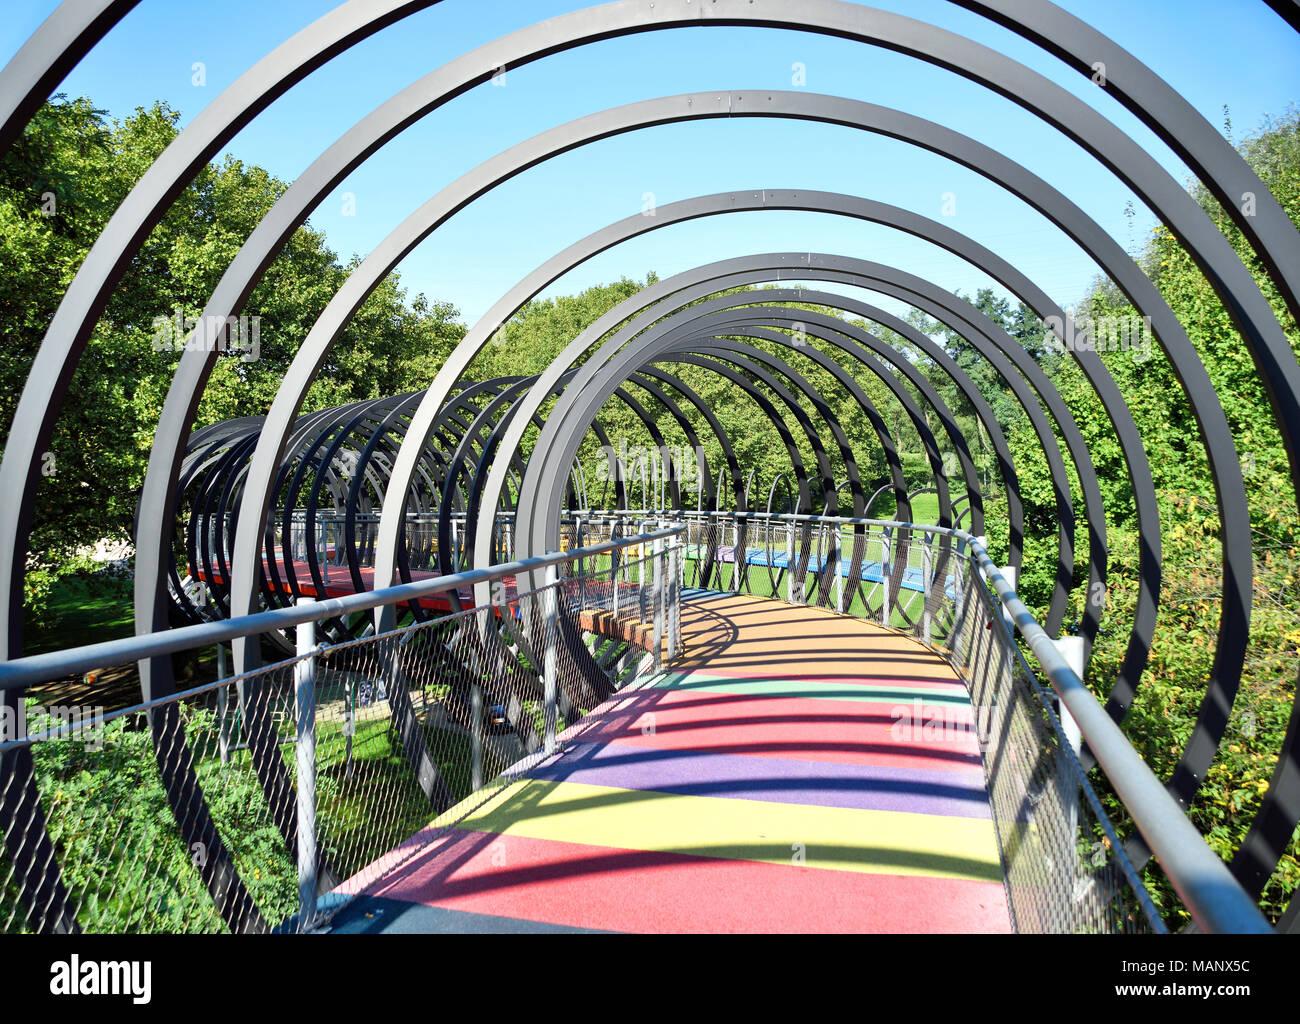 Slinky springs bridge, Kaisergarten Oberhausen.Modern architecture, design bridge. - Stock Image